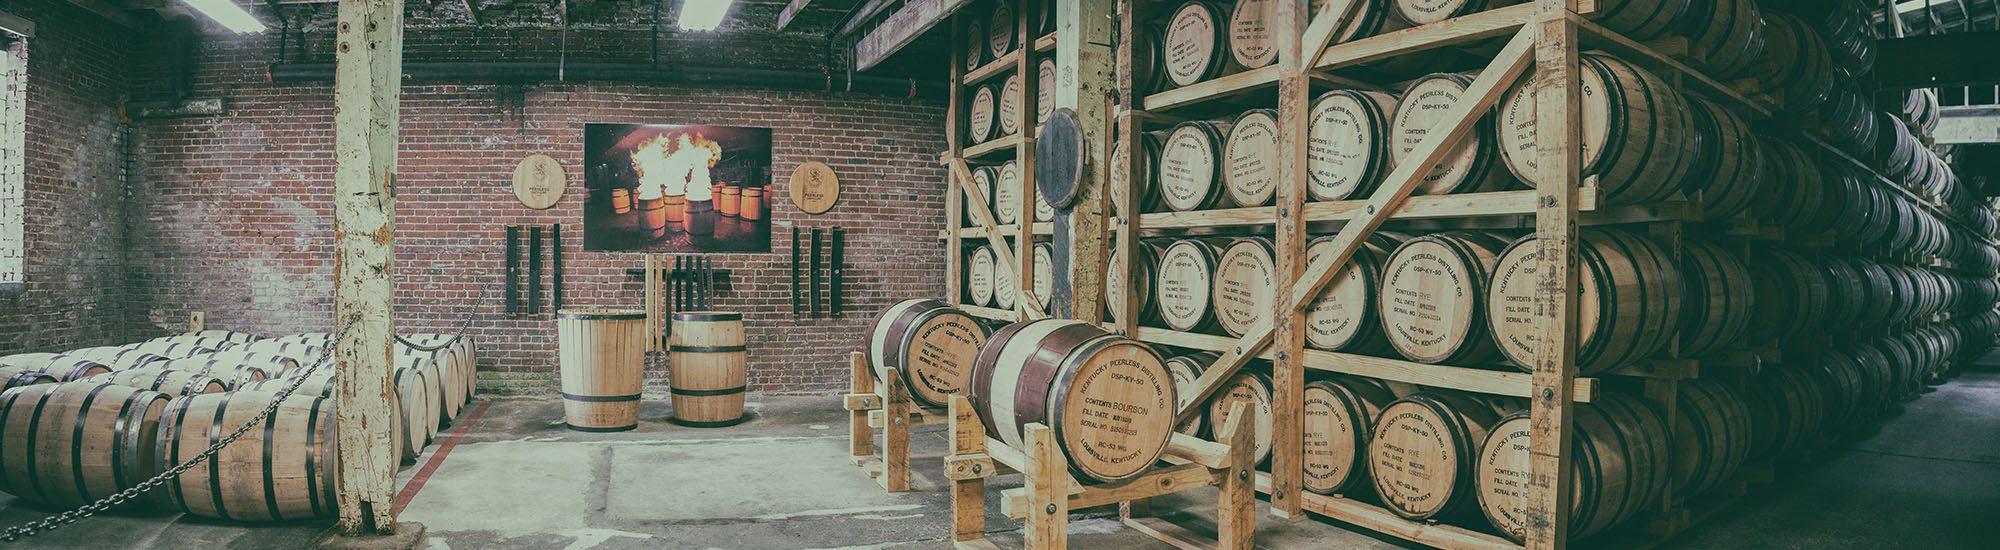 Bourbon, rye whiskey and Lucky Kentucky Moonshine